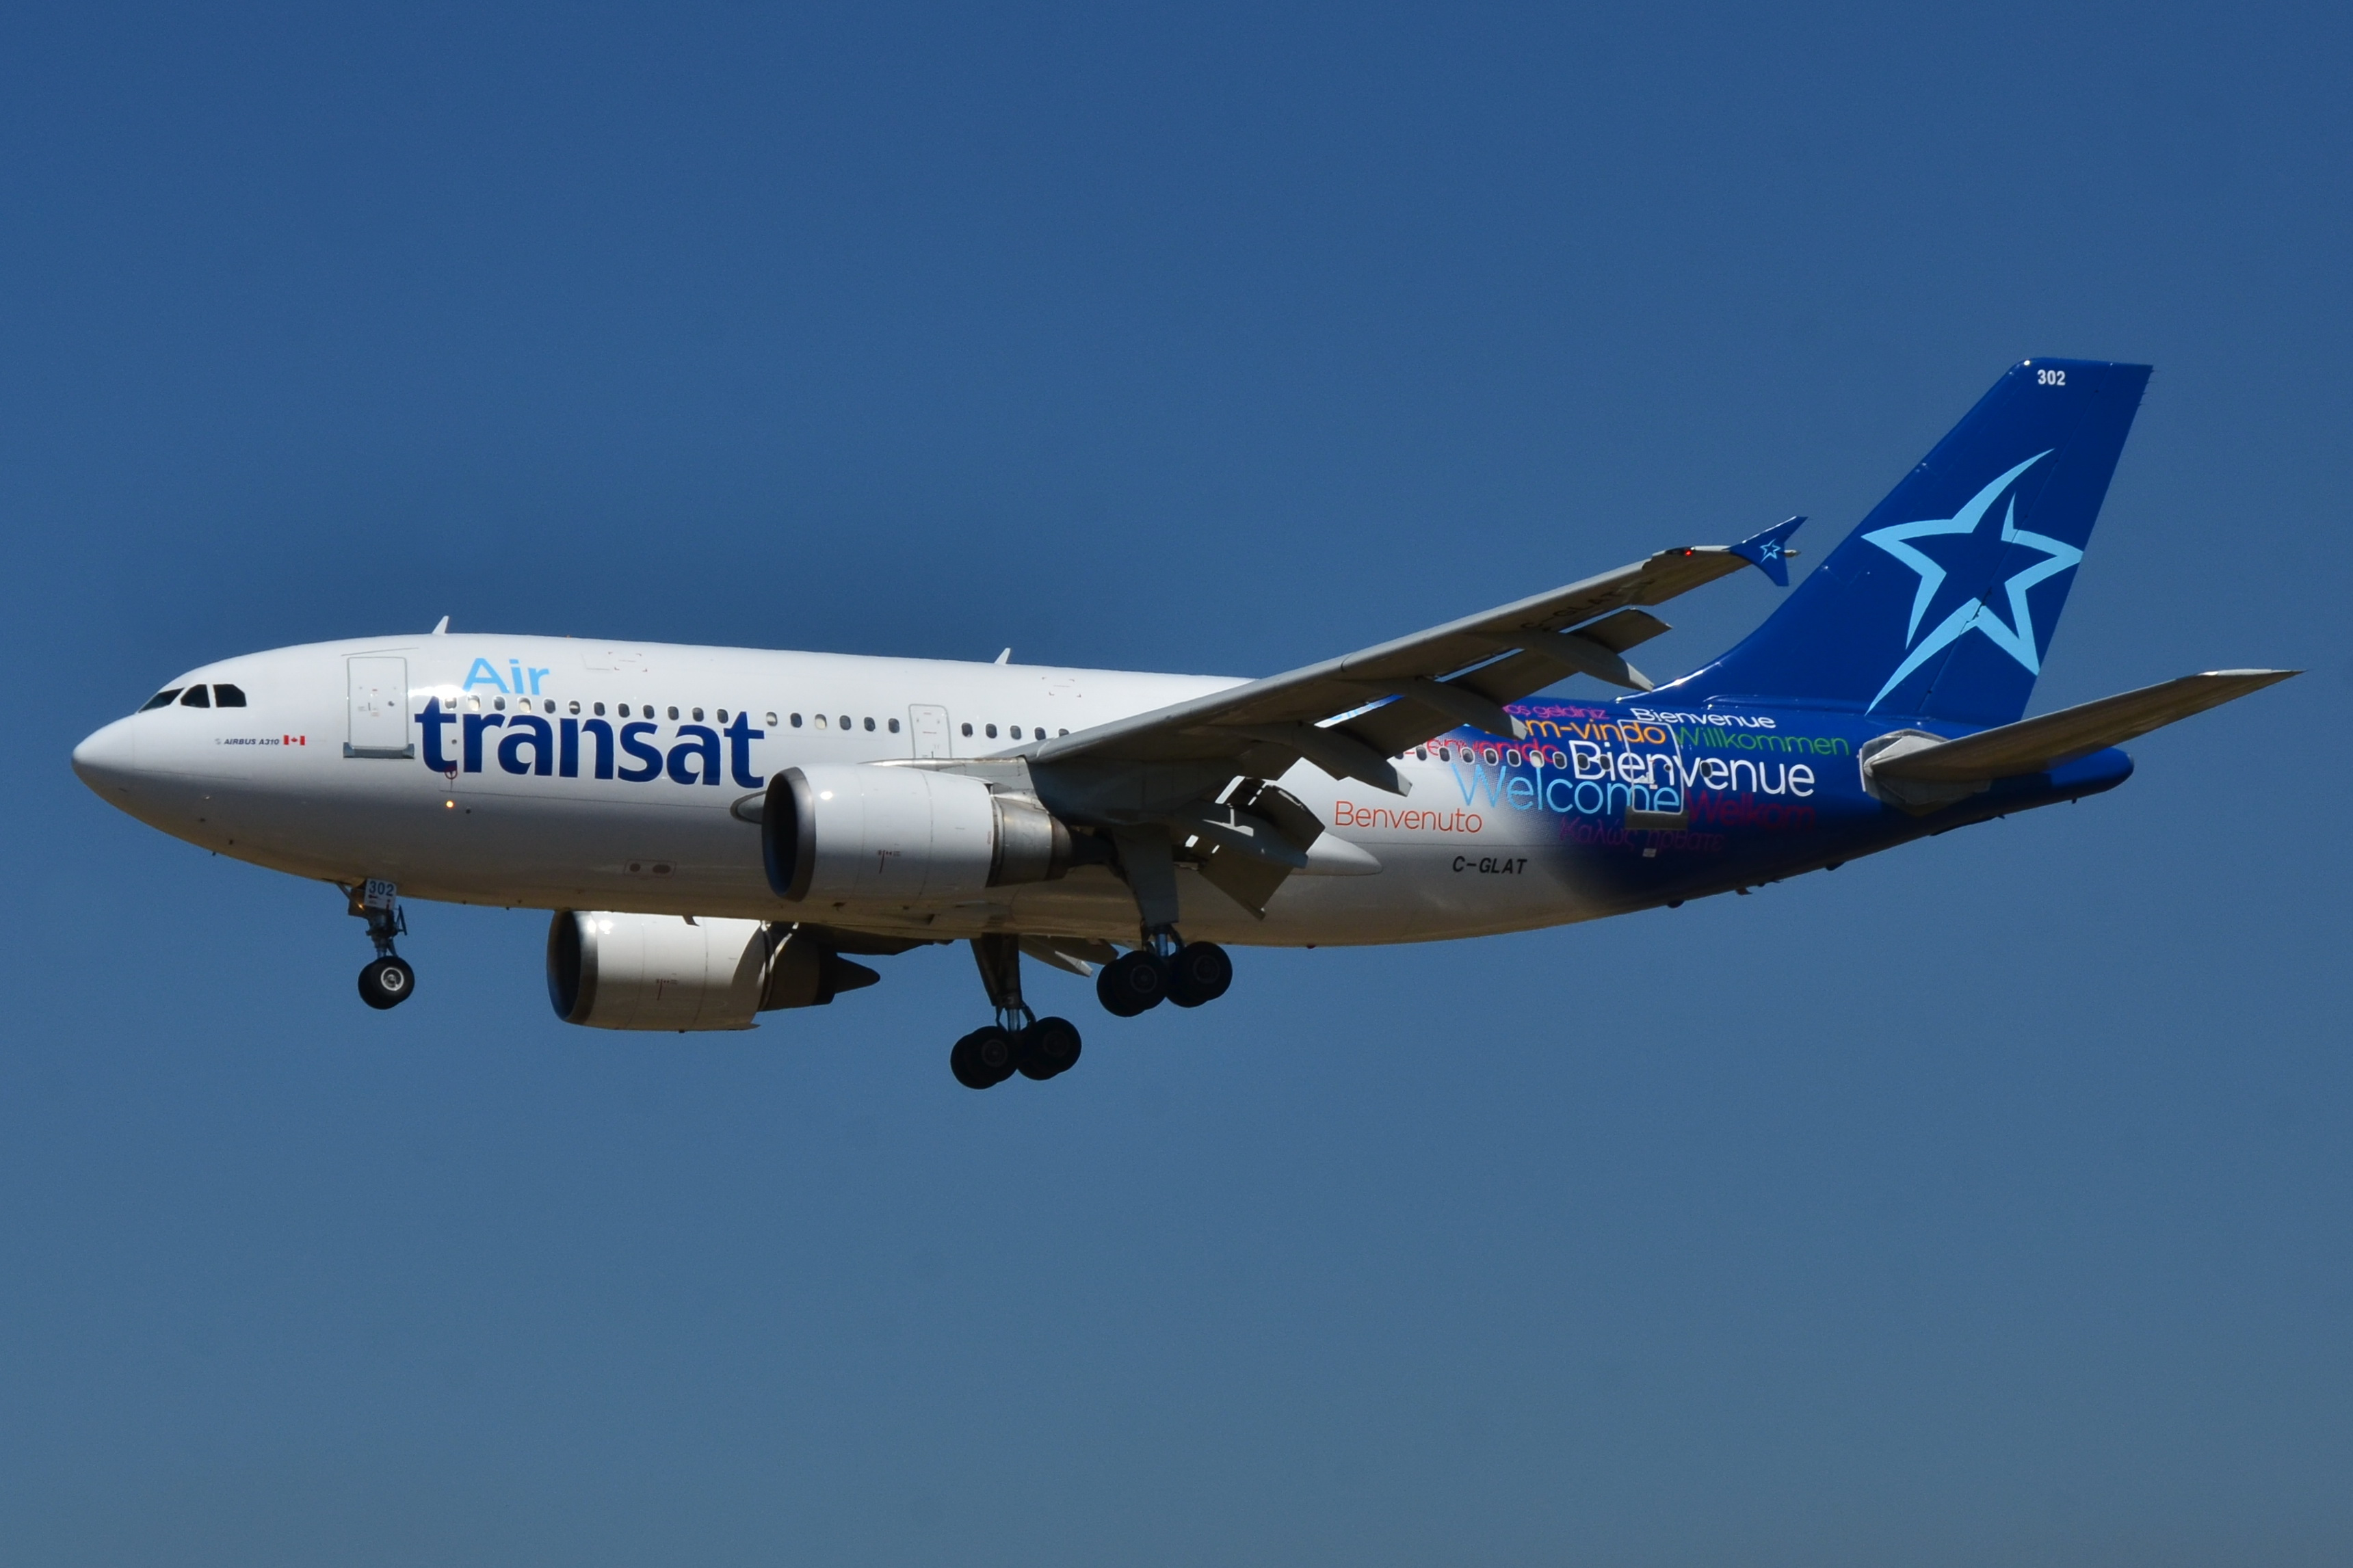 file airbus a310 300 air transat tsc c glat msn 588 9510329329 jpg